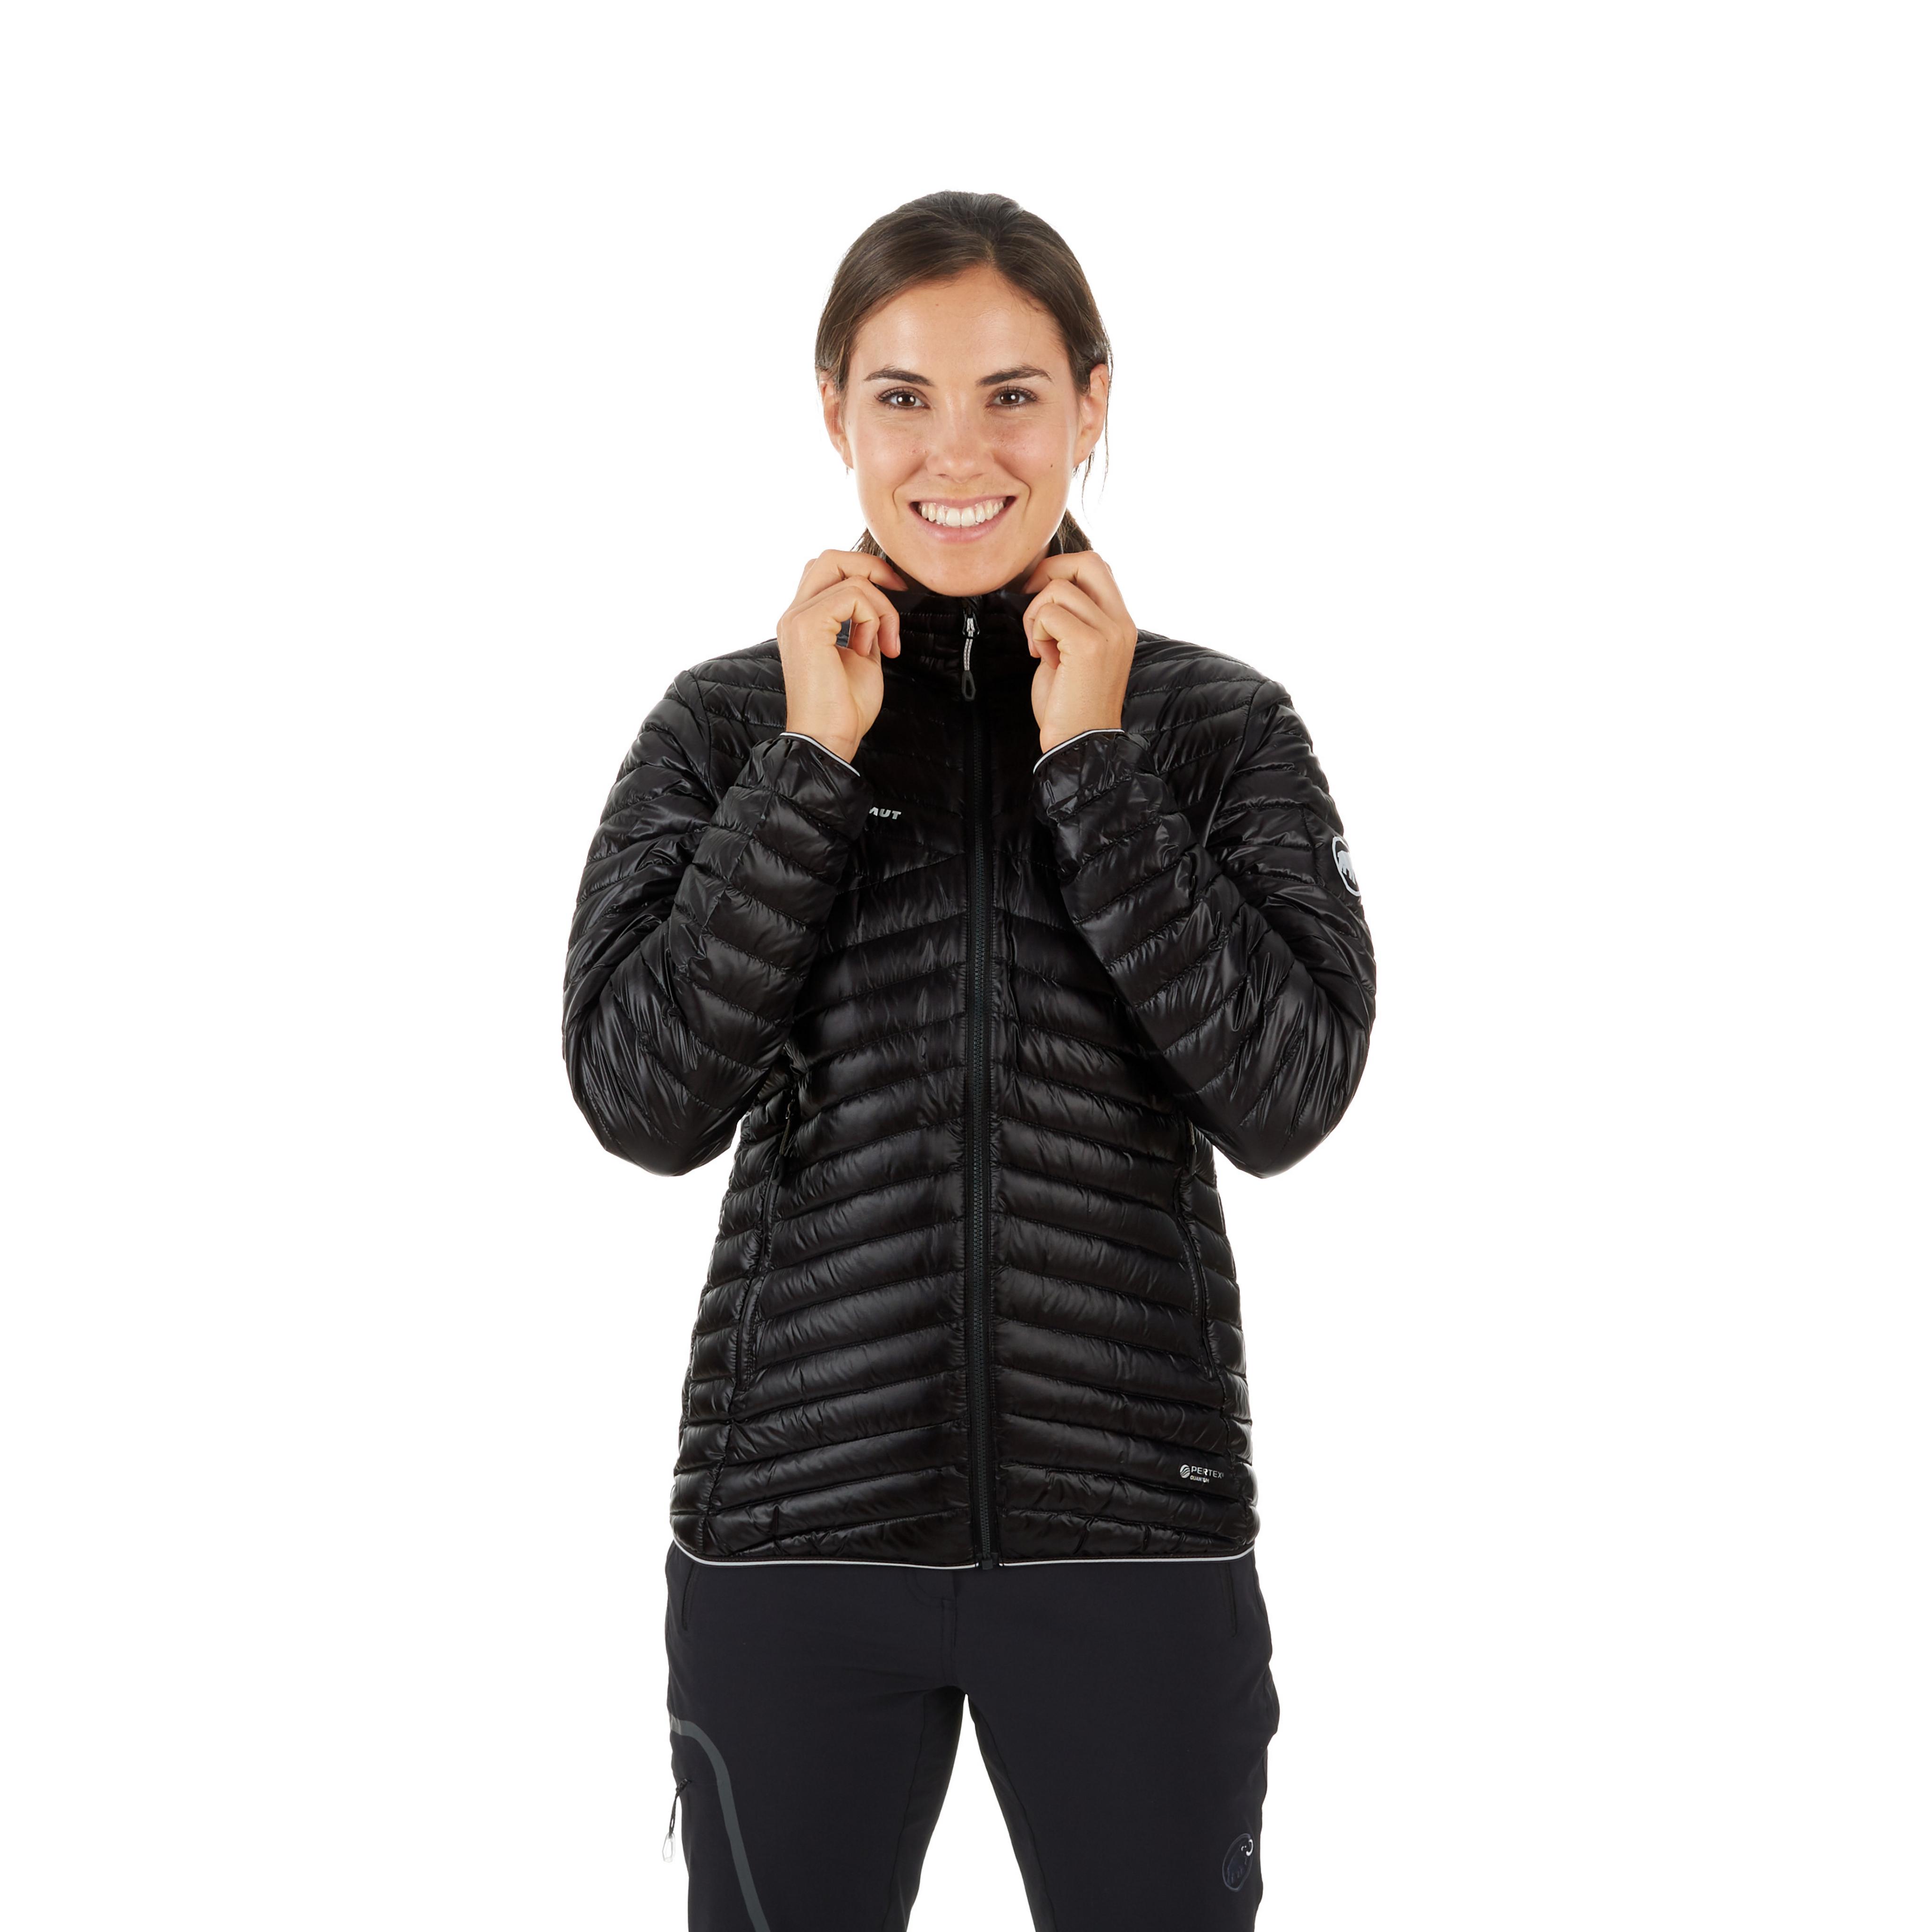 Broad Peak Light IN Jacket Women product image